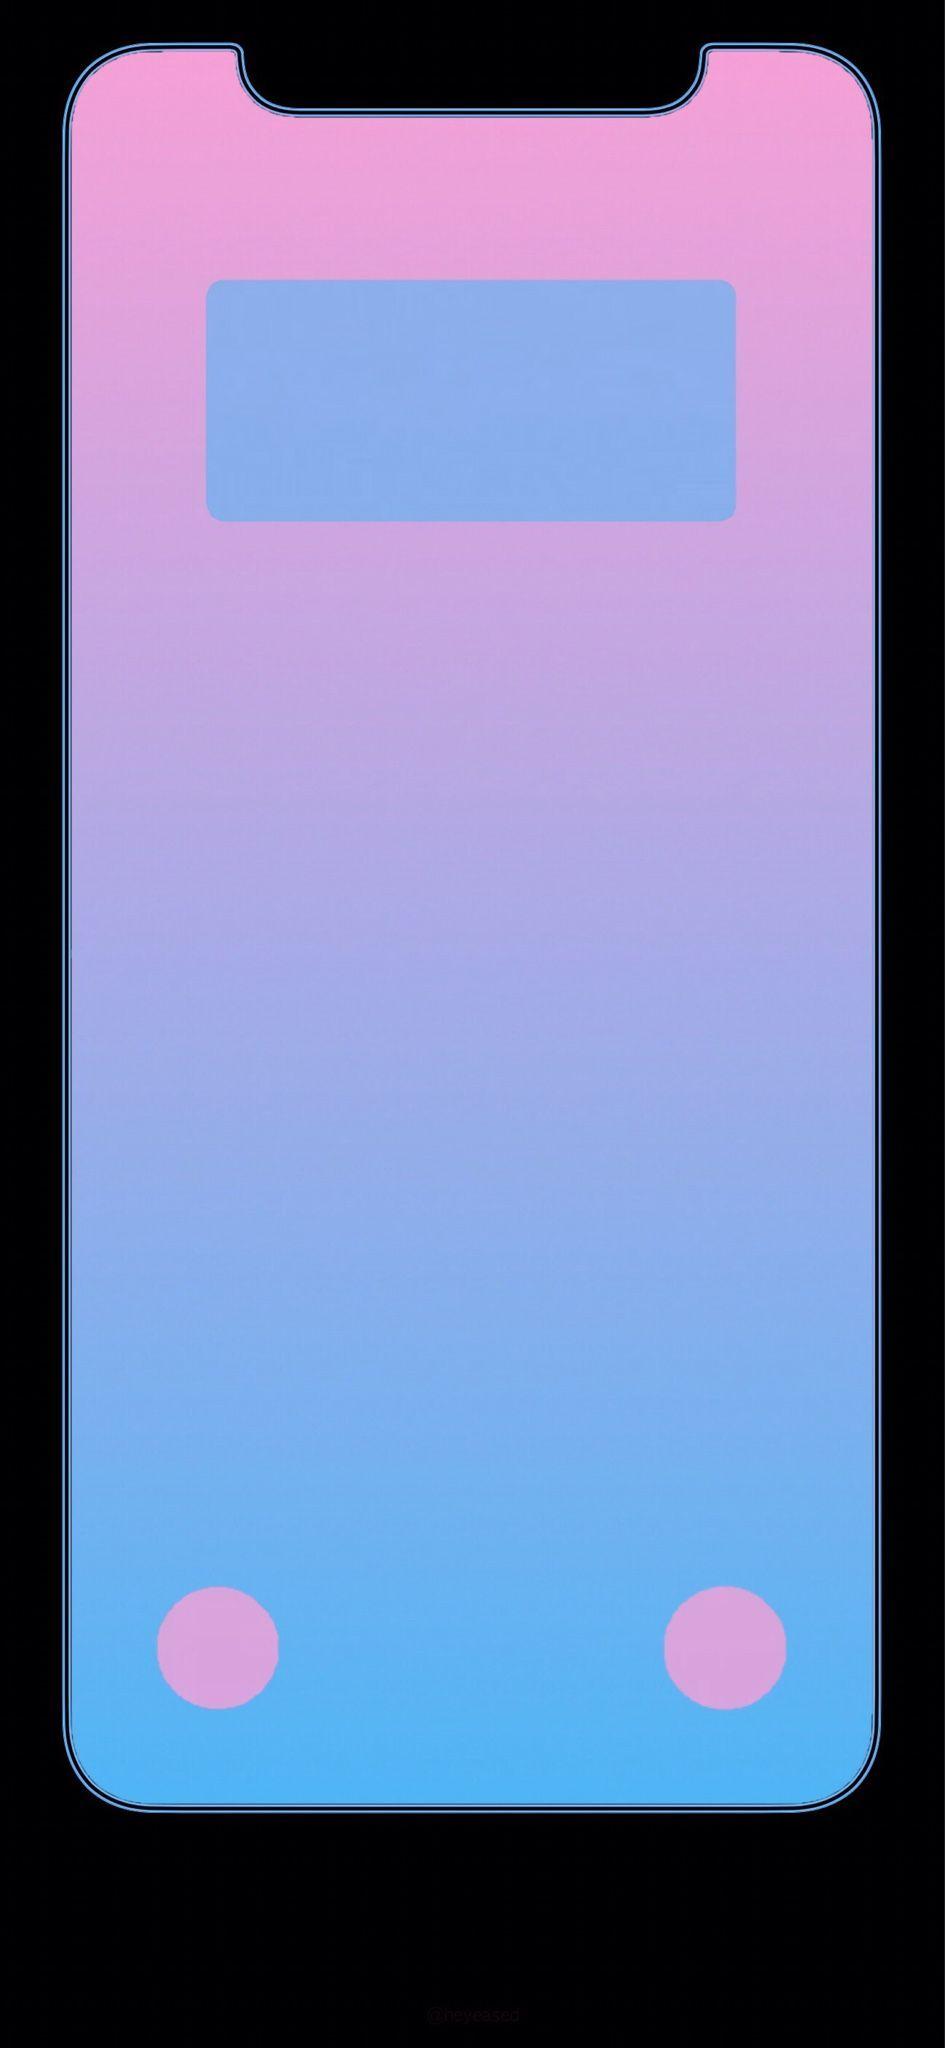 Https All Images Net Iphone Wallpaper Vaporwave Hd 4k 140